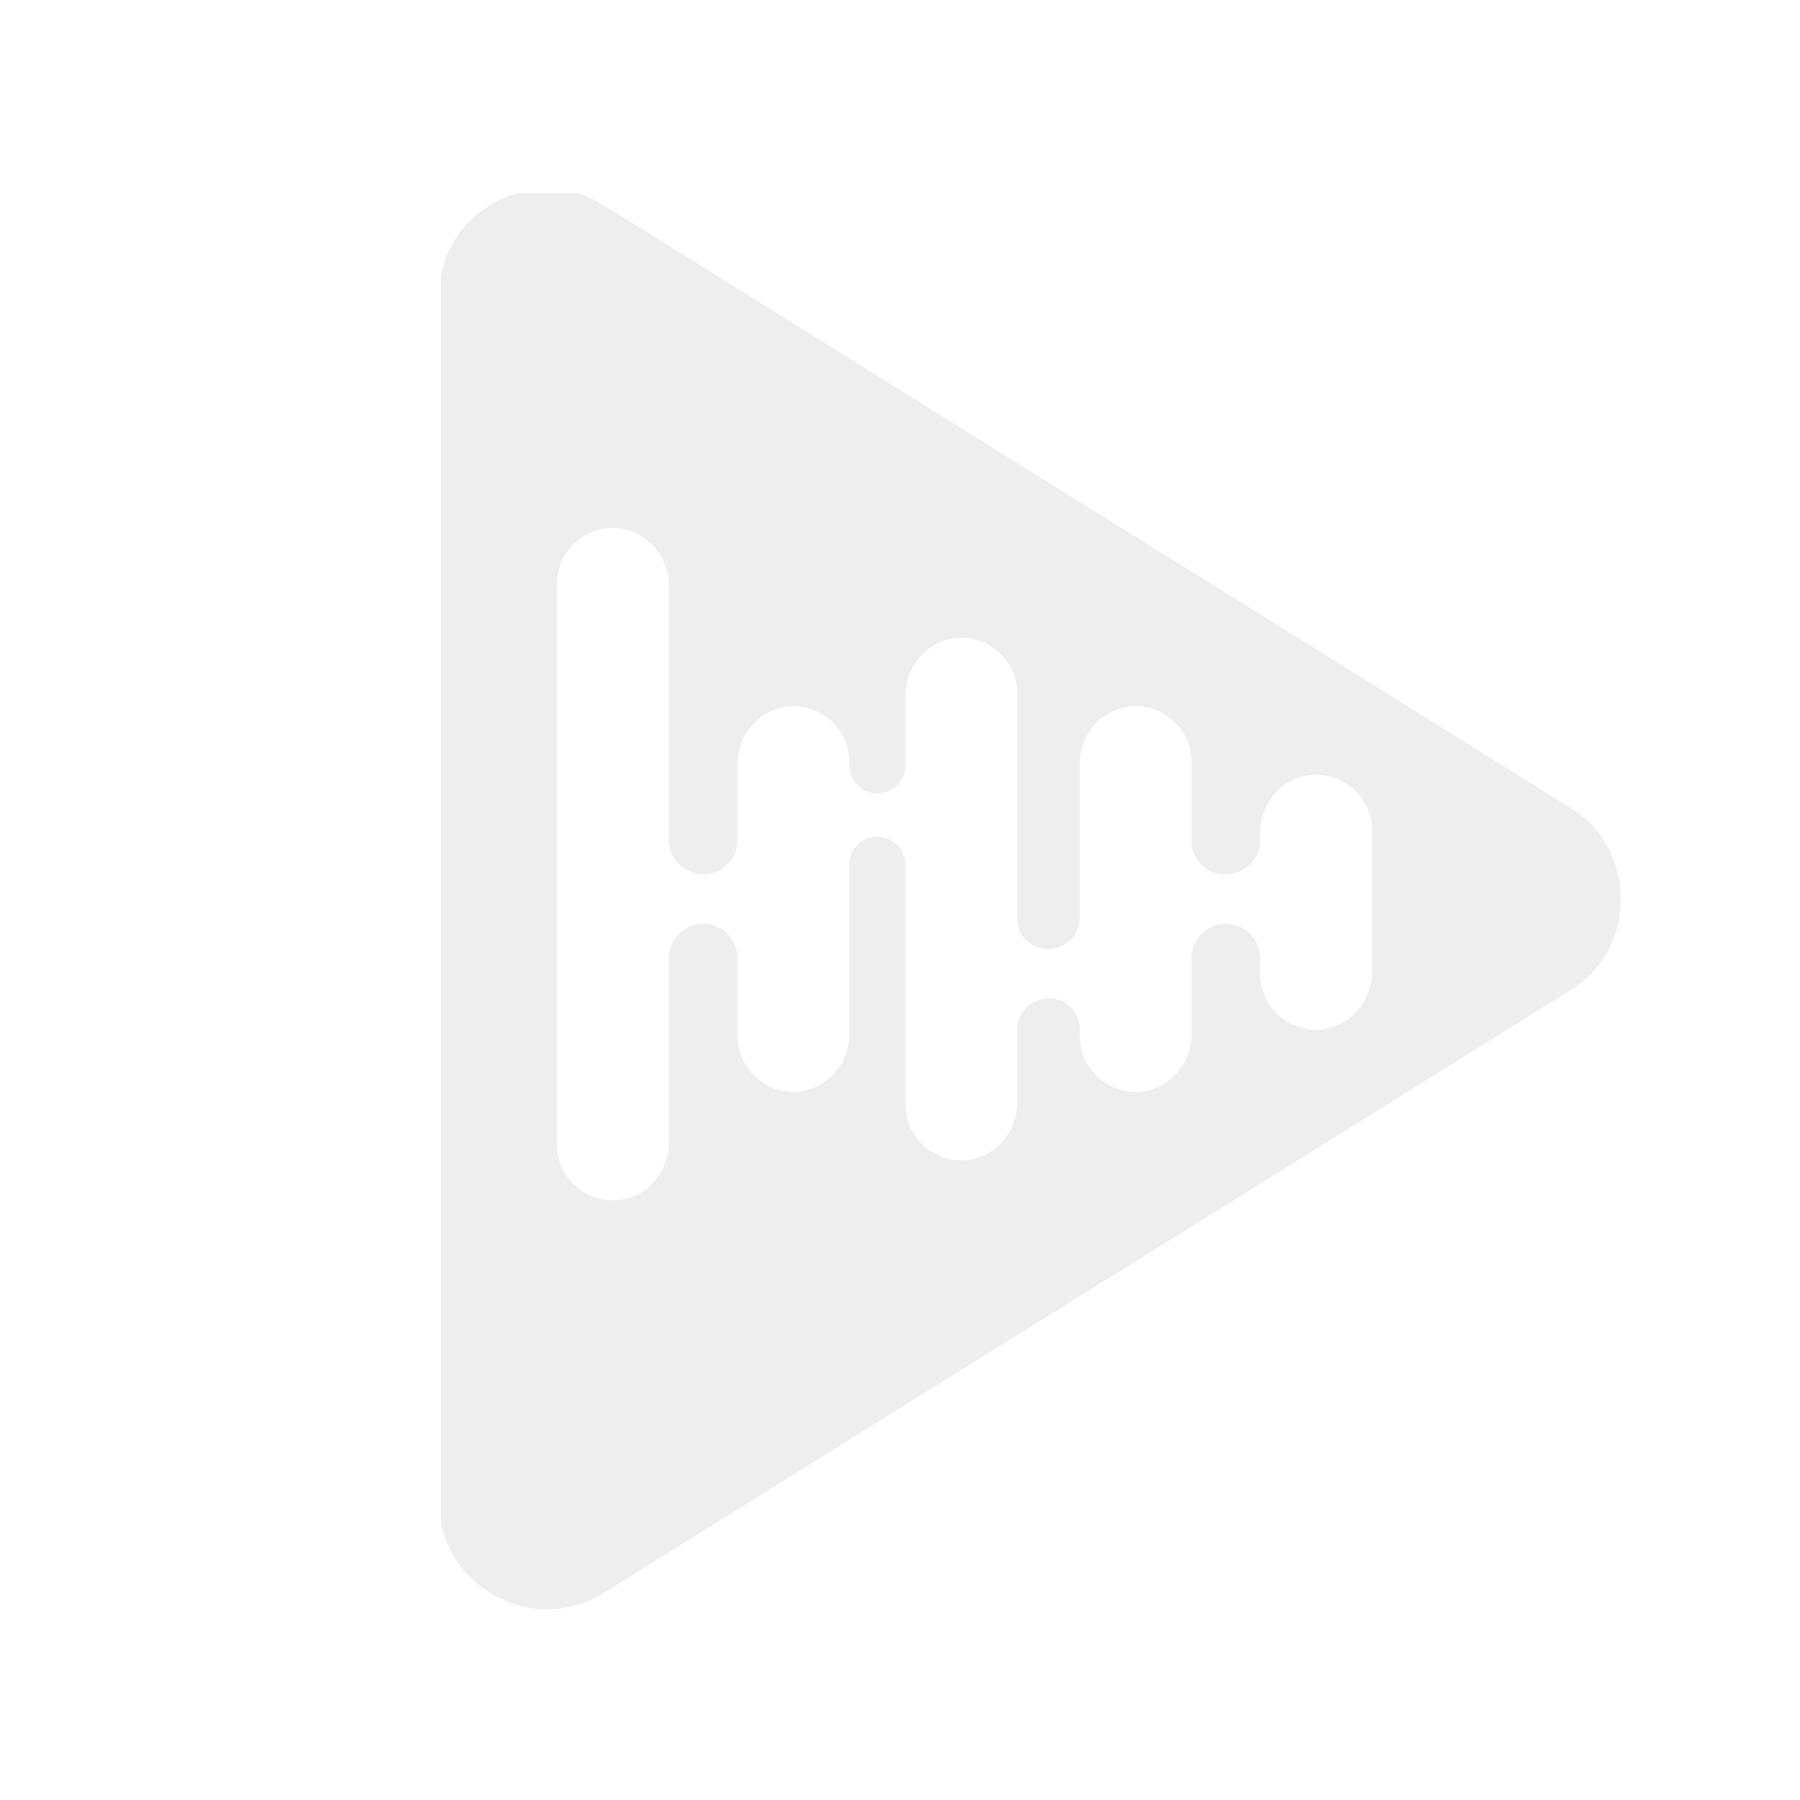 Canton ASF 75 SC - Hvit